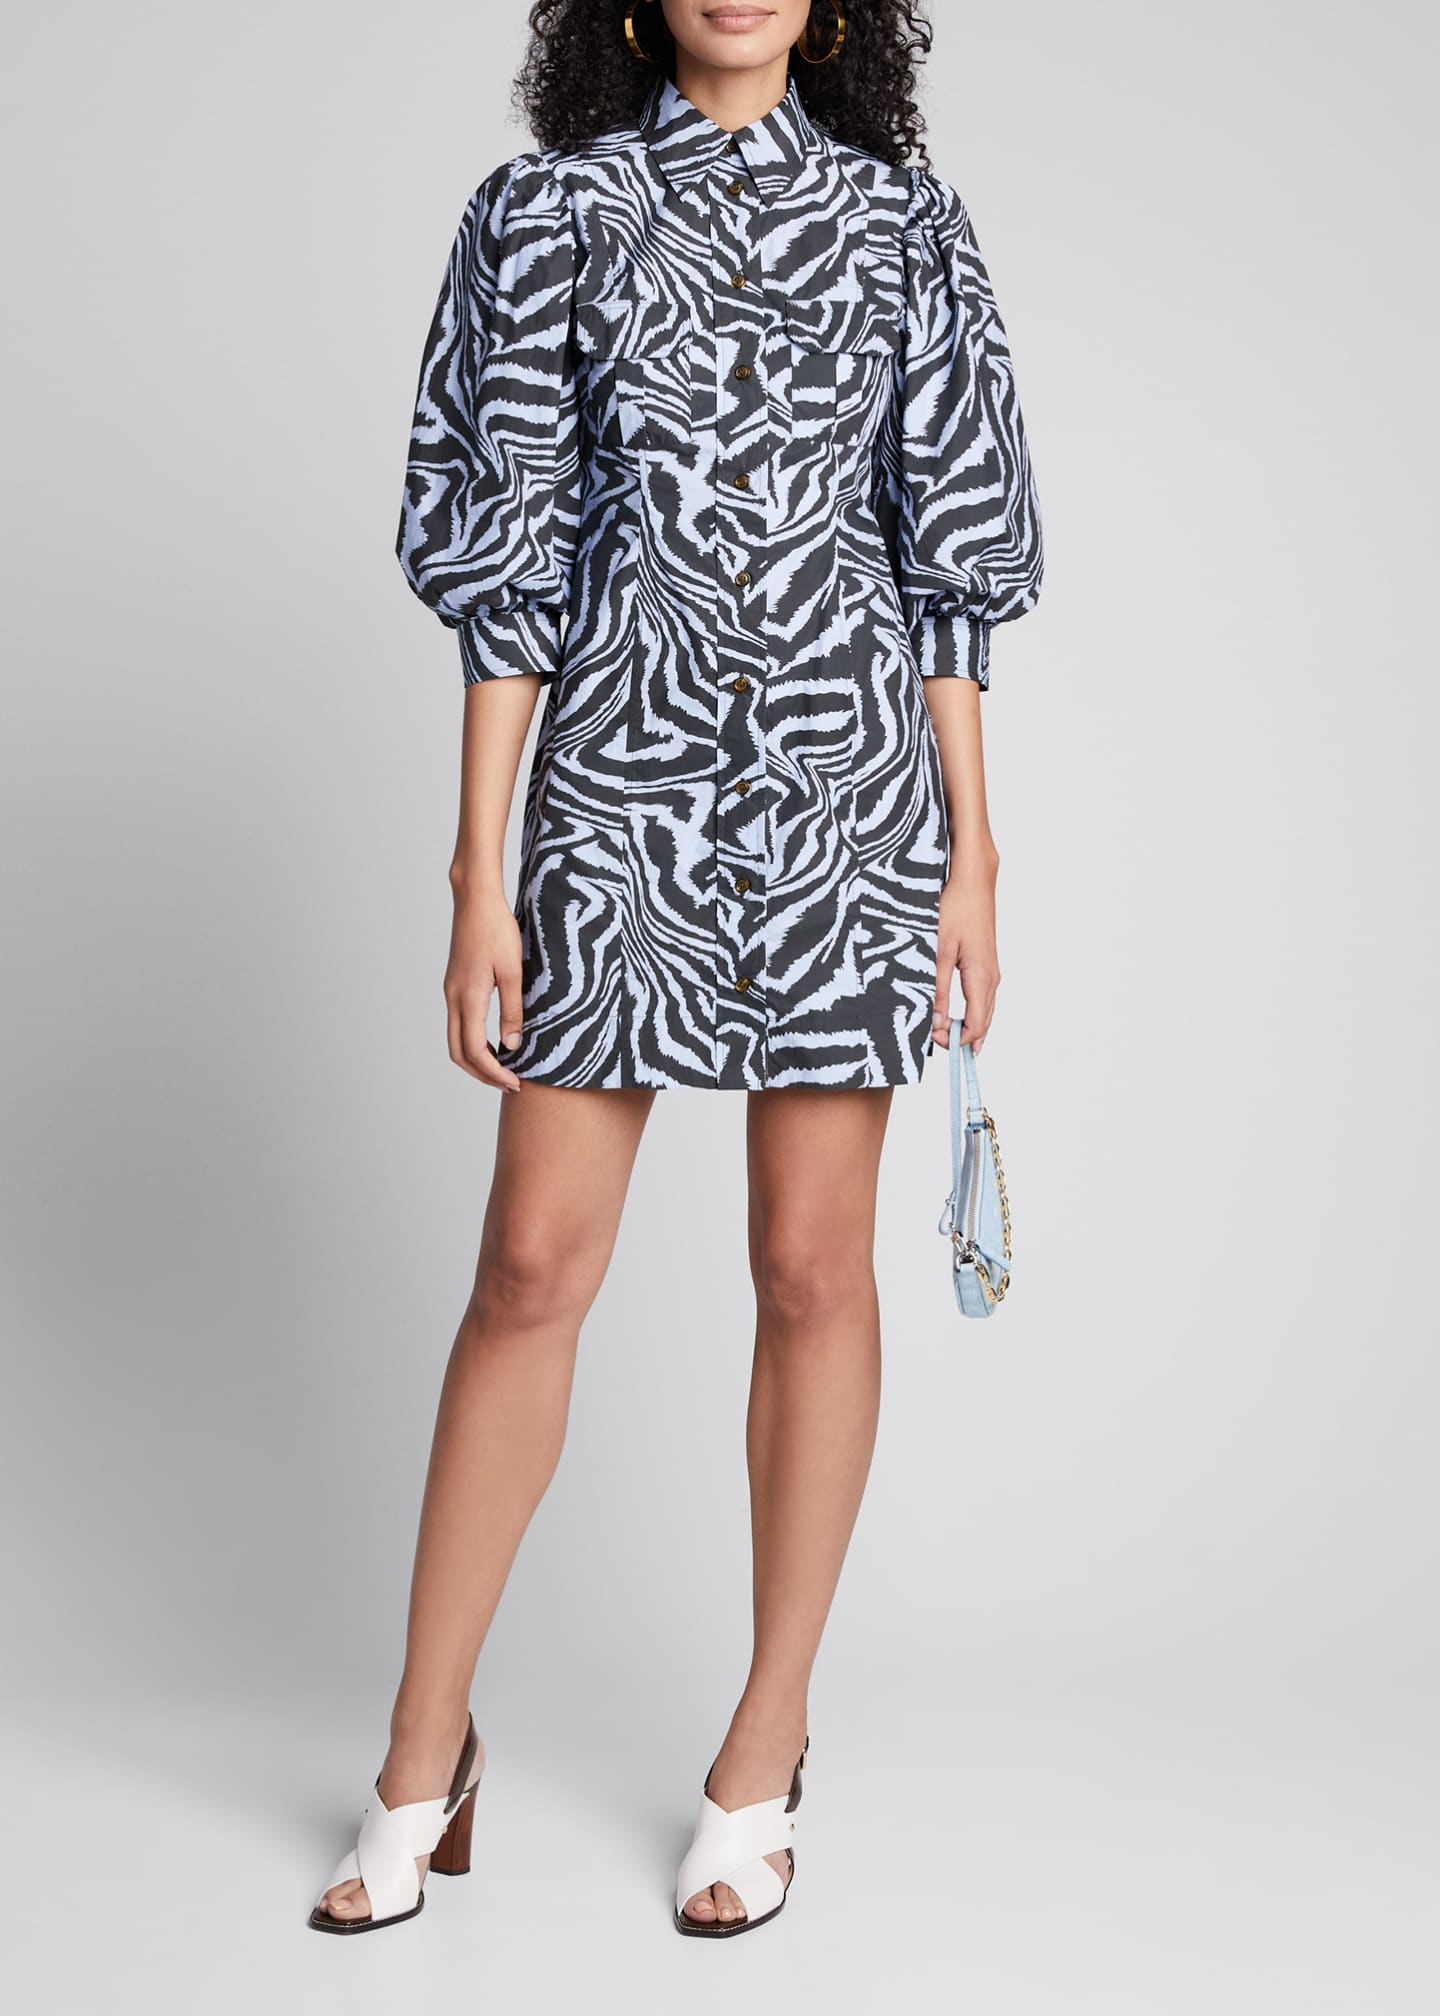 Ganni Printed Poplin Puff-Sleeve Shirt Dress